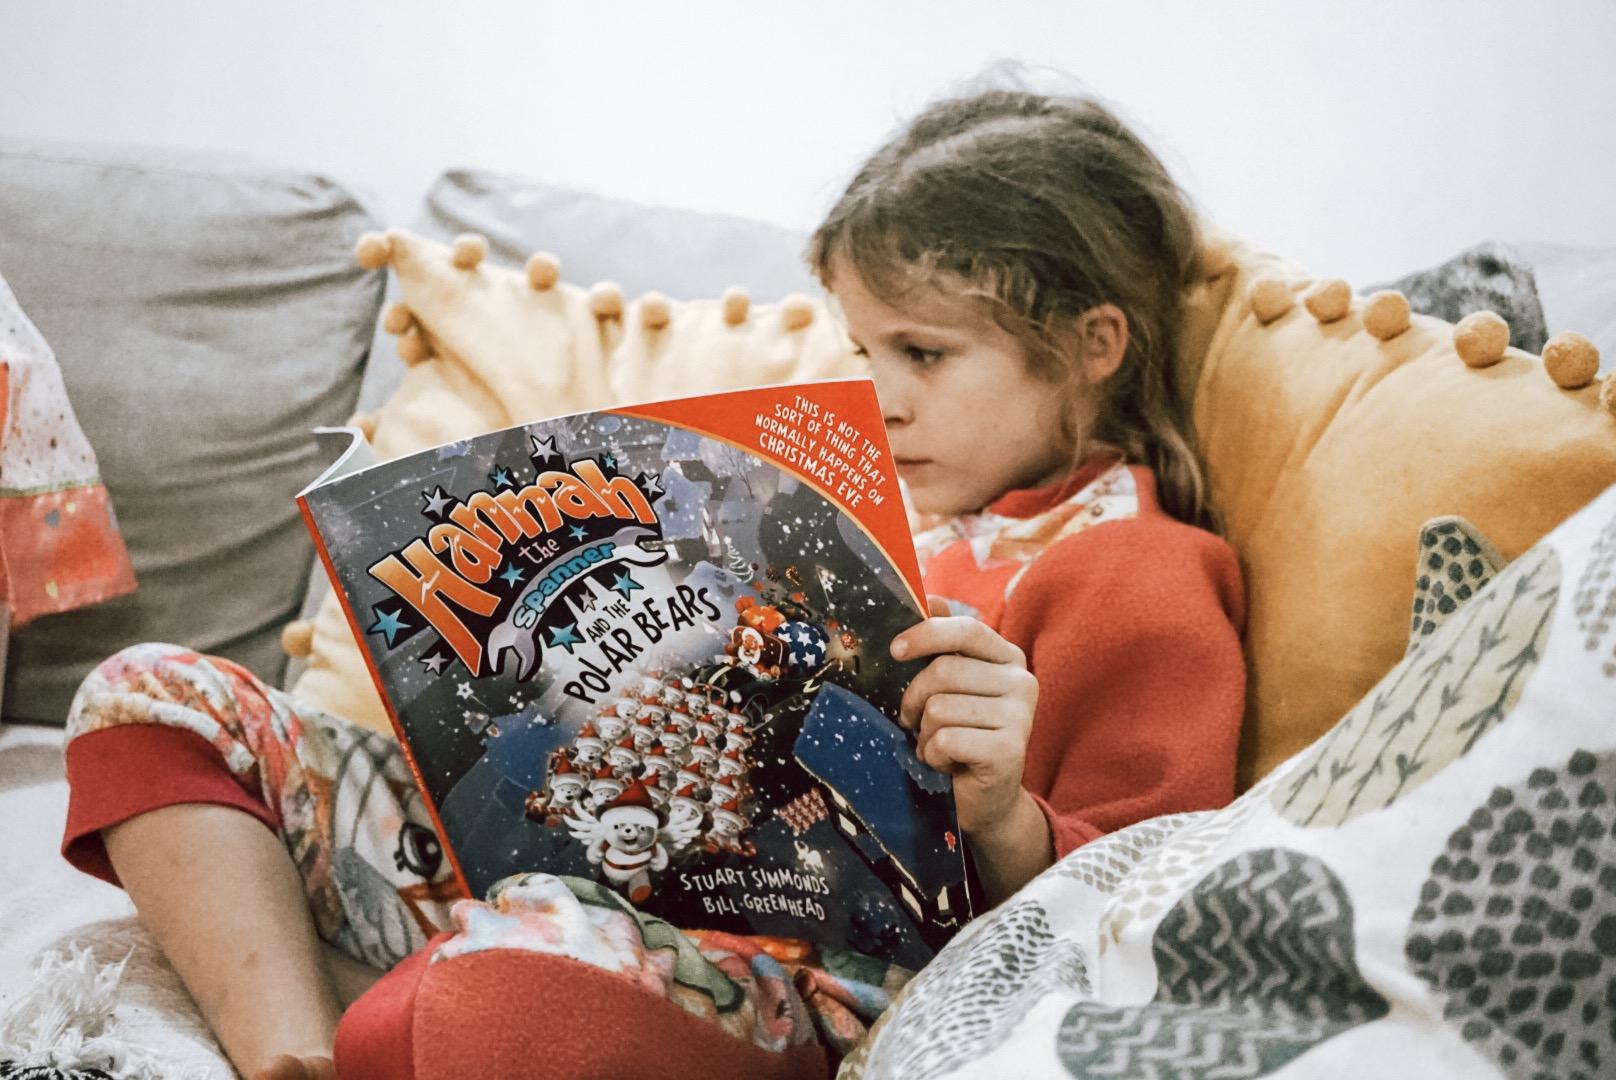 Isla reading a book